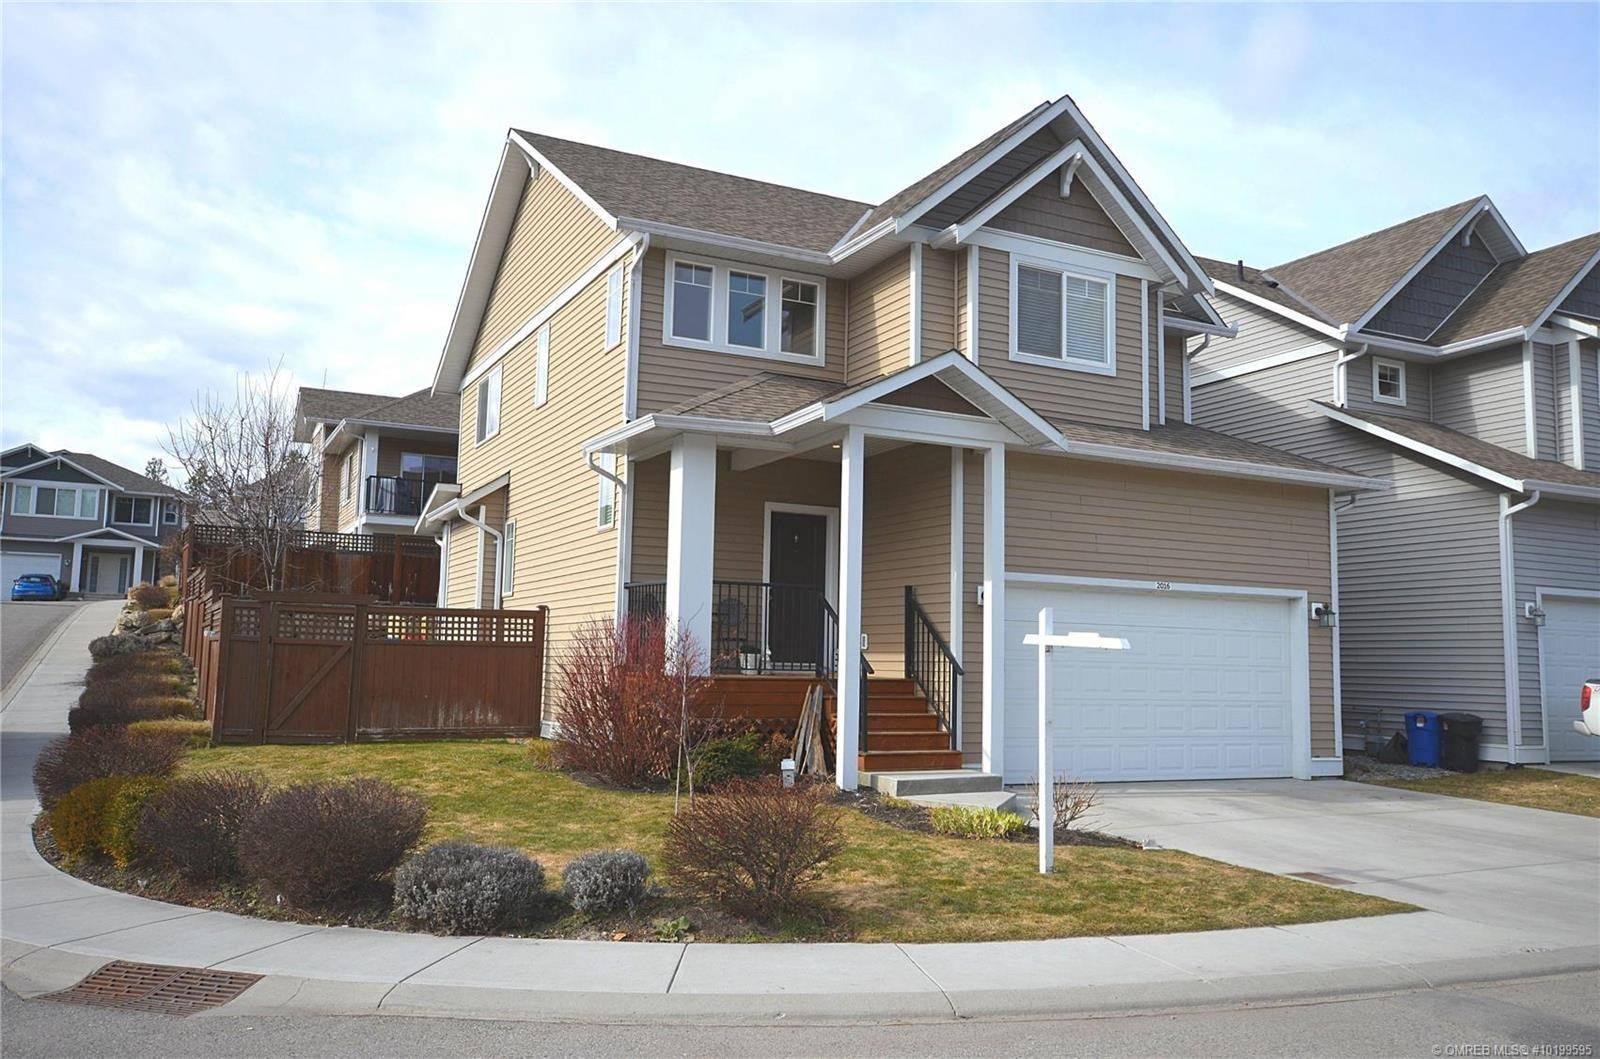 House for sale at 2016 Elkridge Dr West Kelowna British Columbia - MLS: 10199595